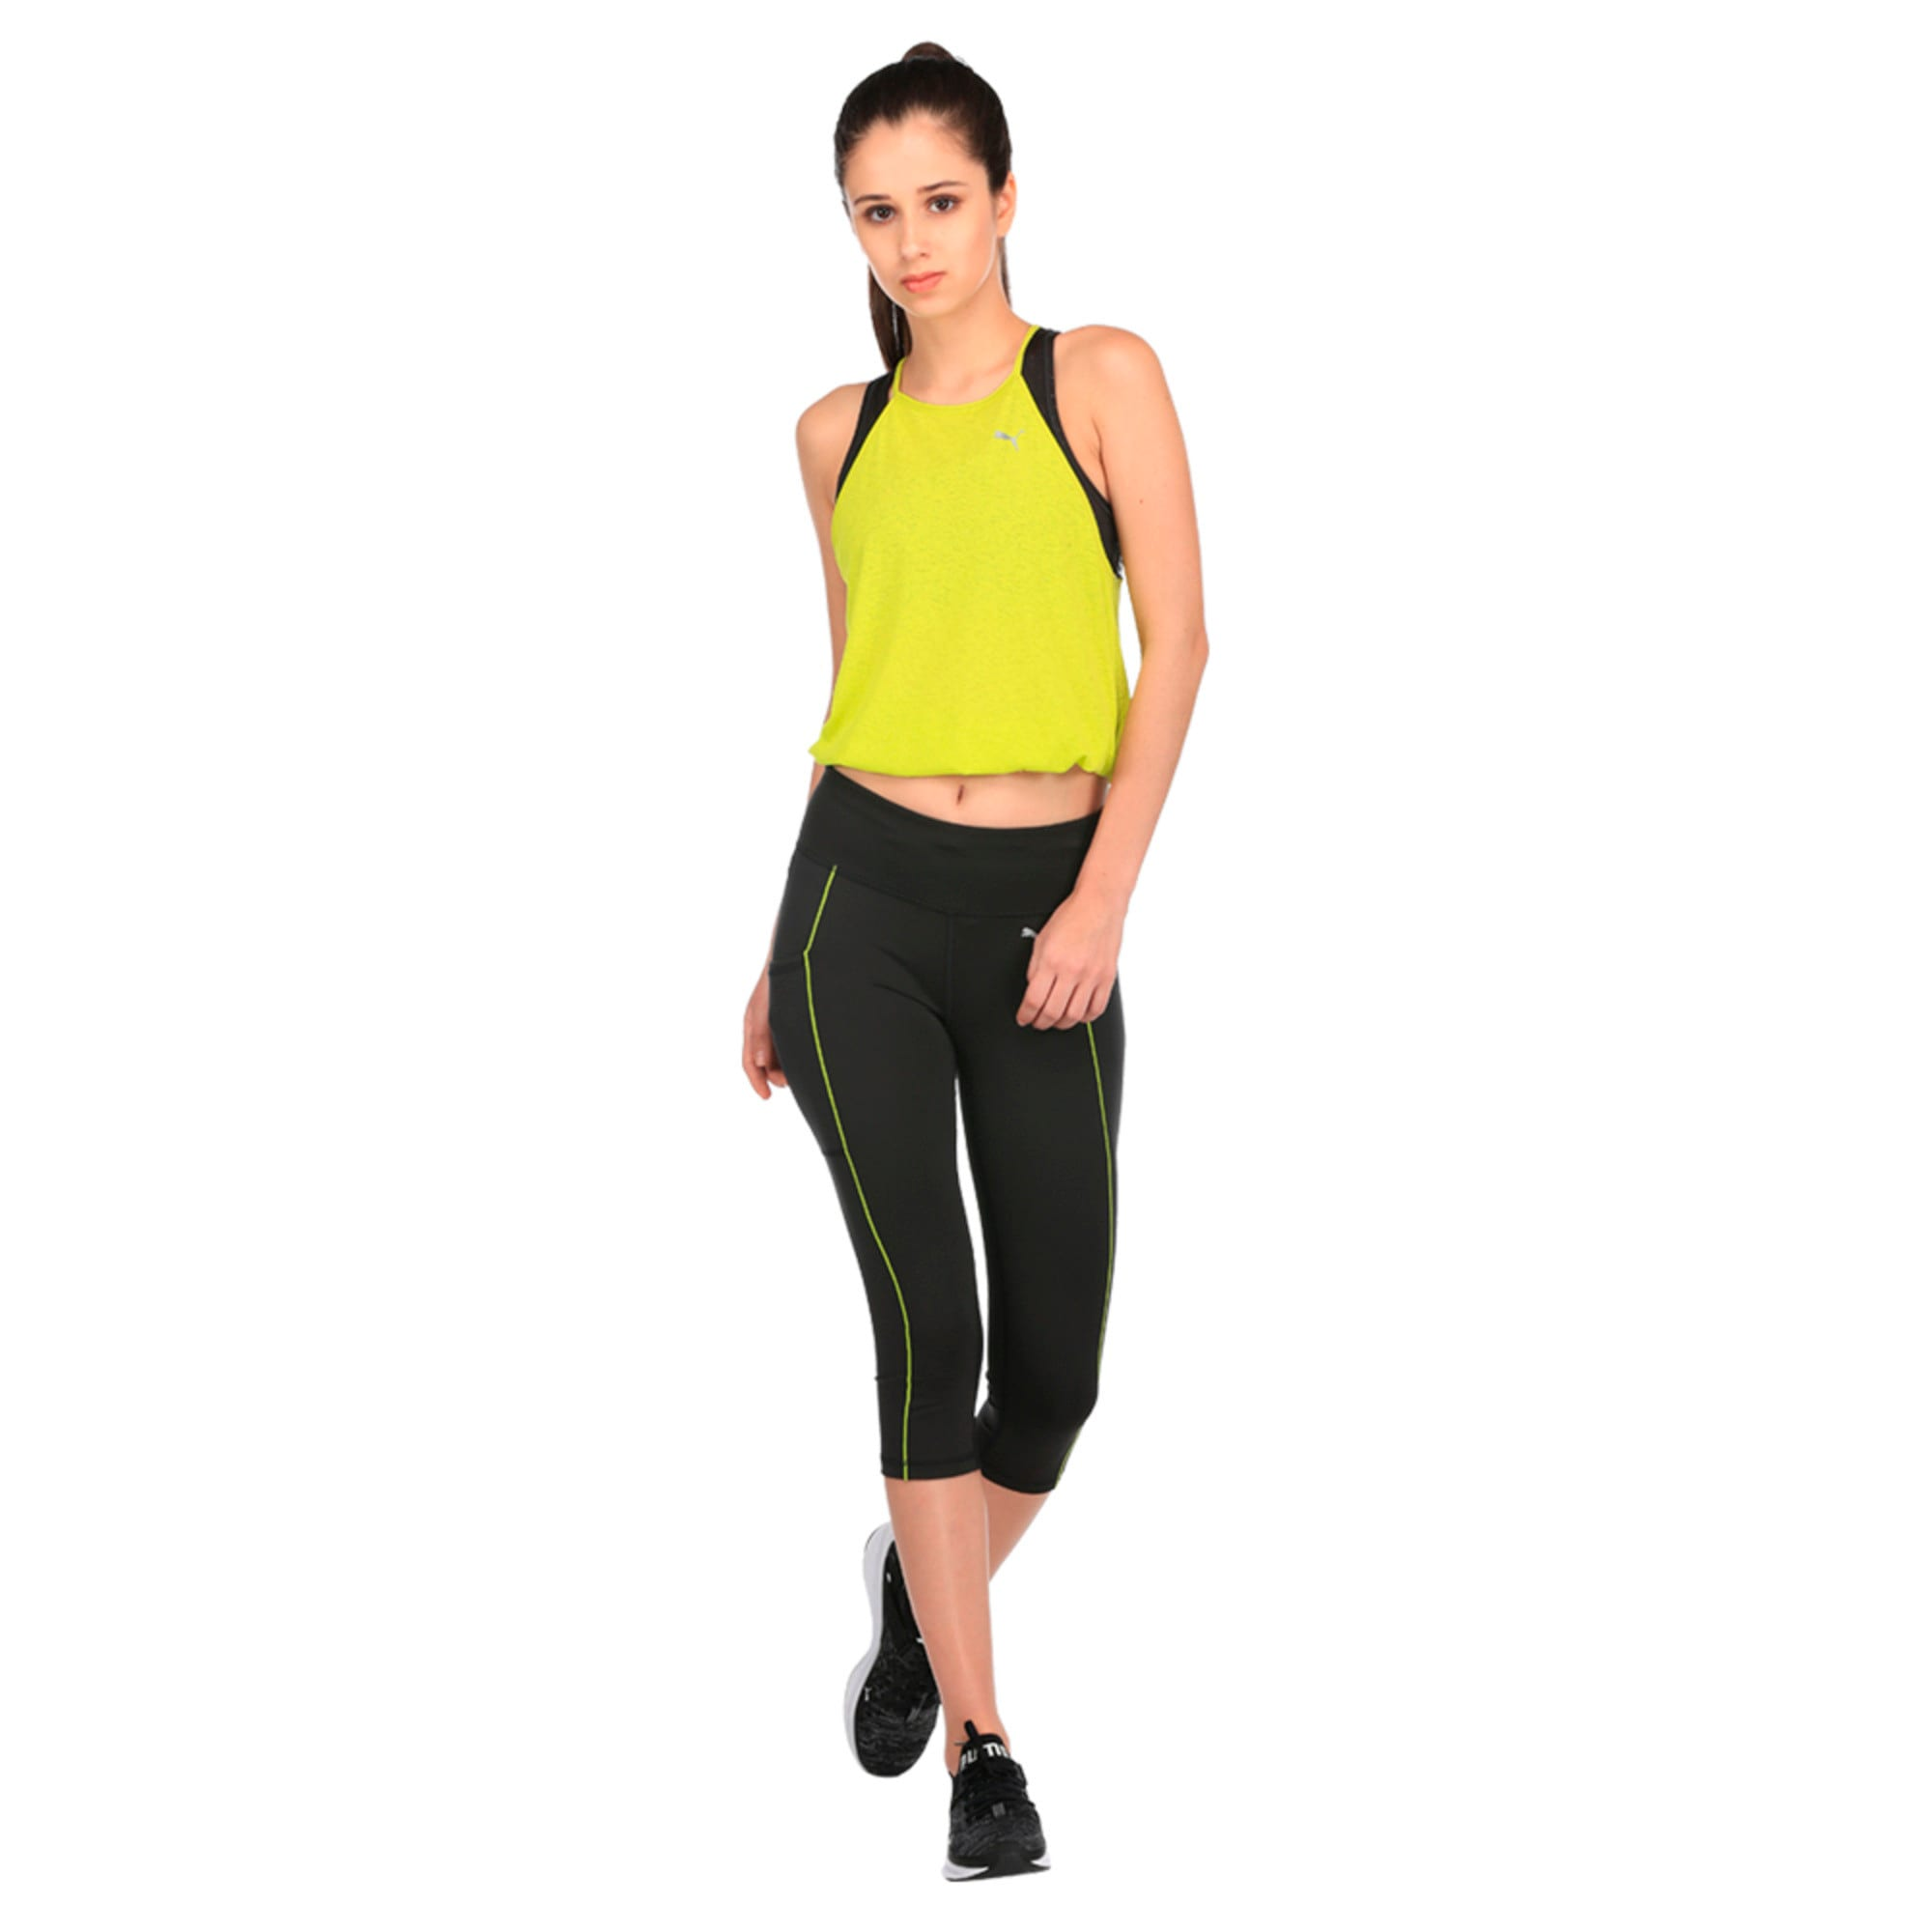 Thumbnail 3 of Running Women's PWRCOOL Speed 3/4 Tights, Puma Black-Nrgy Yellow, medium-IND